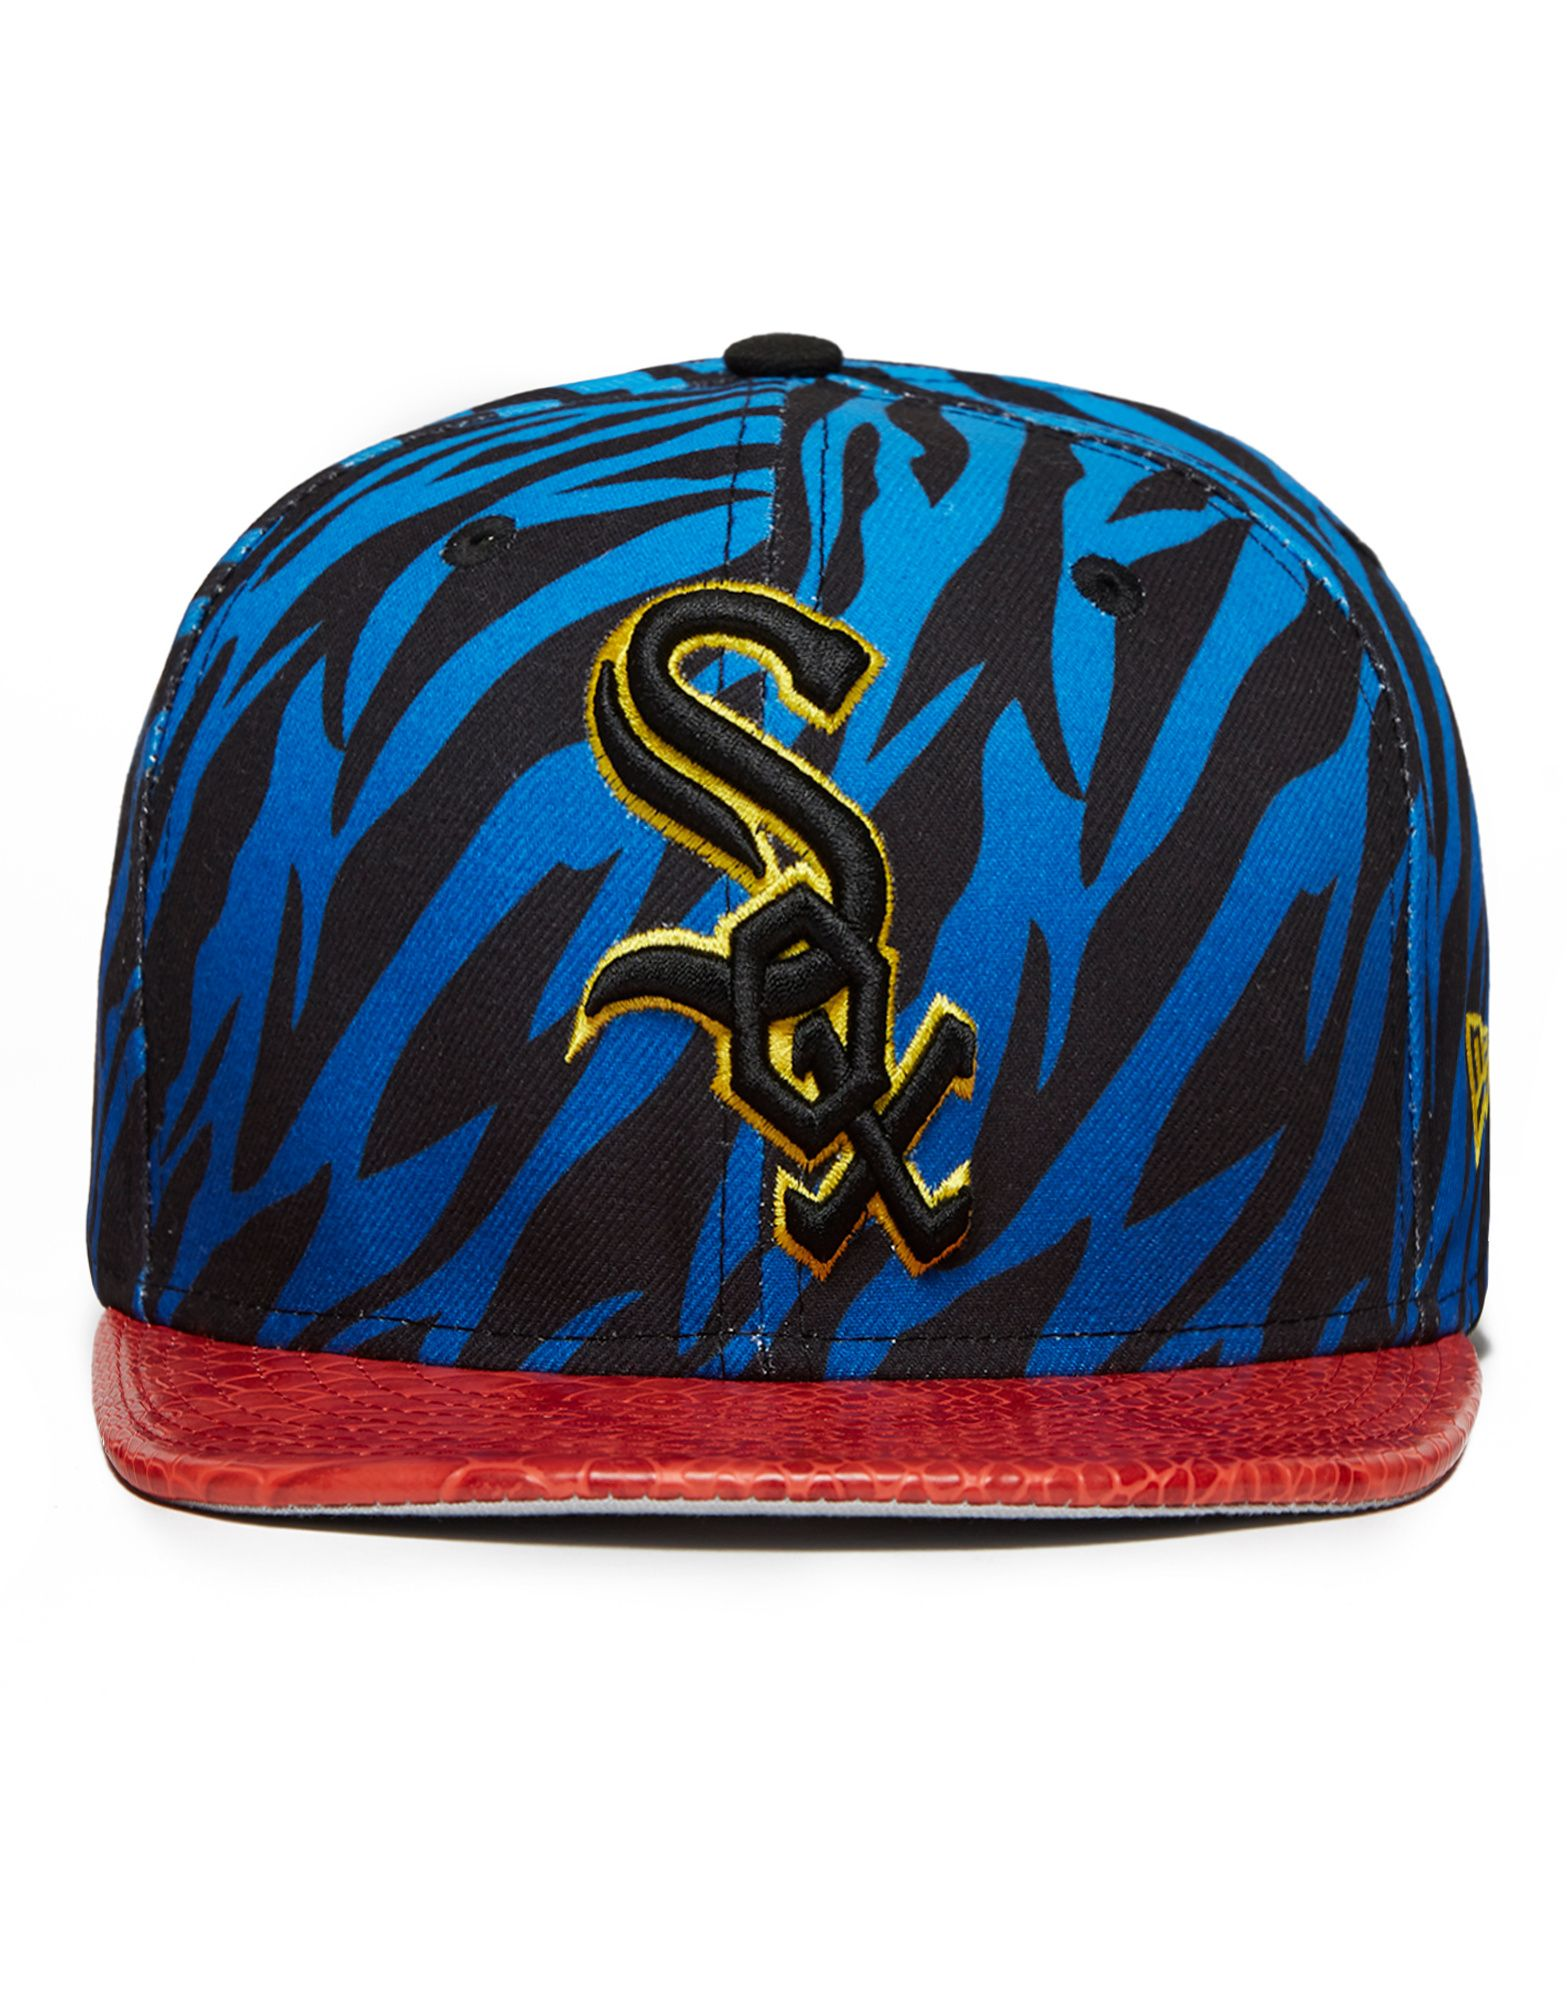 New Era MLB Chicago White Sox 9FIFTY Jungle Snapback Cap